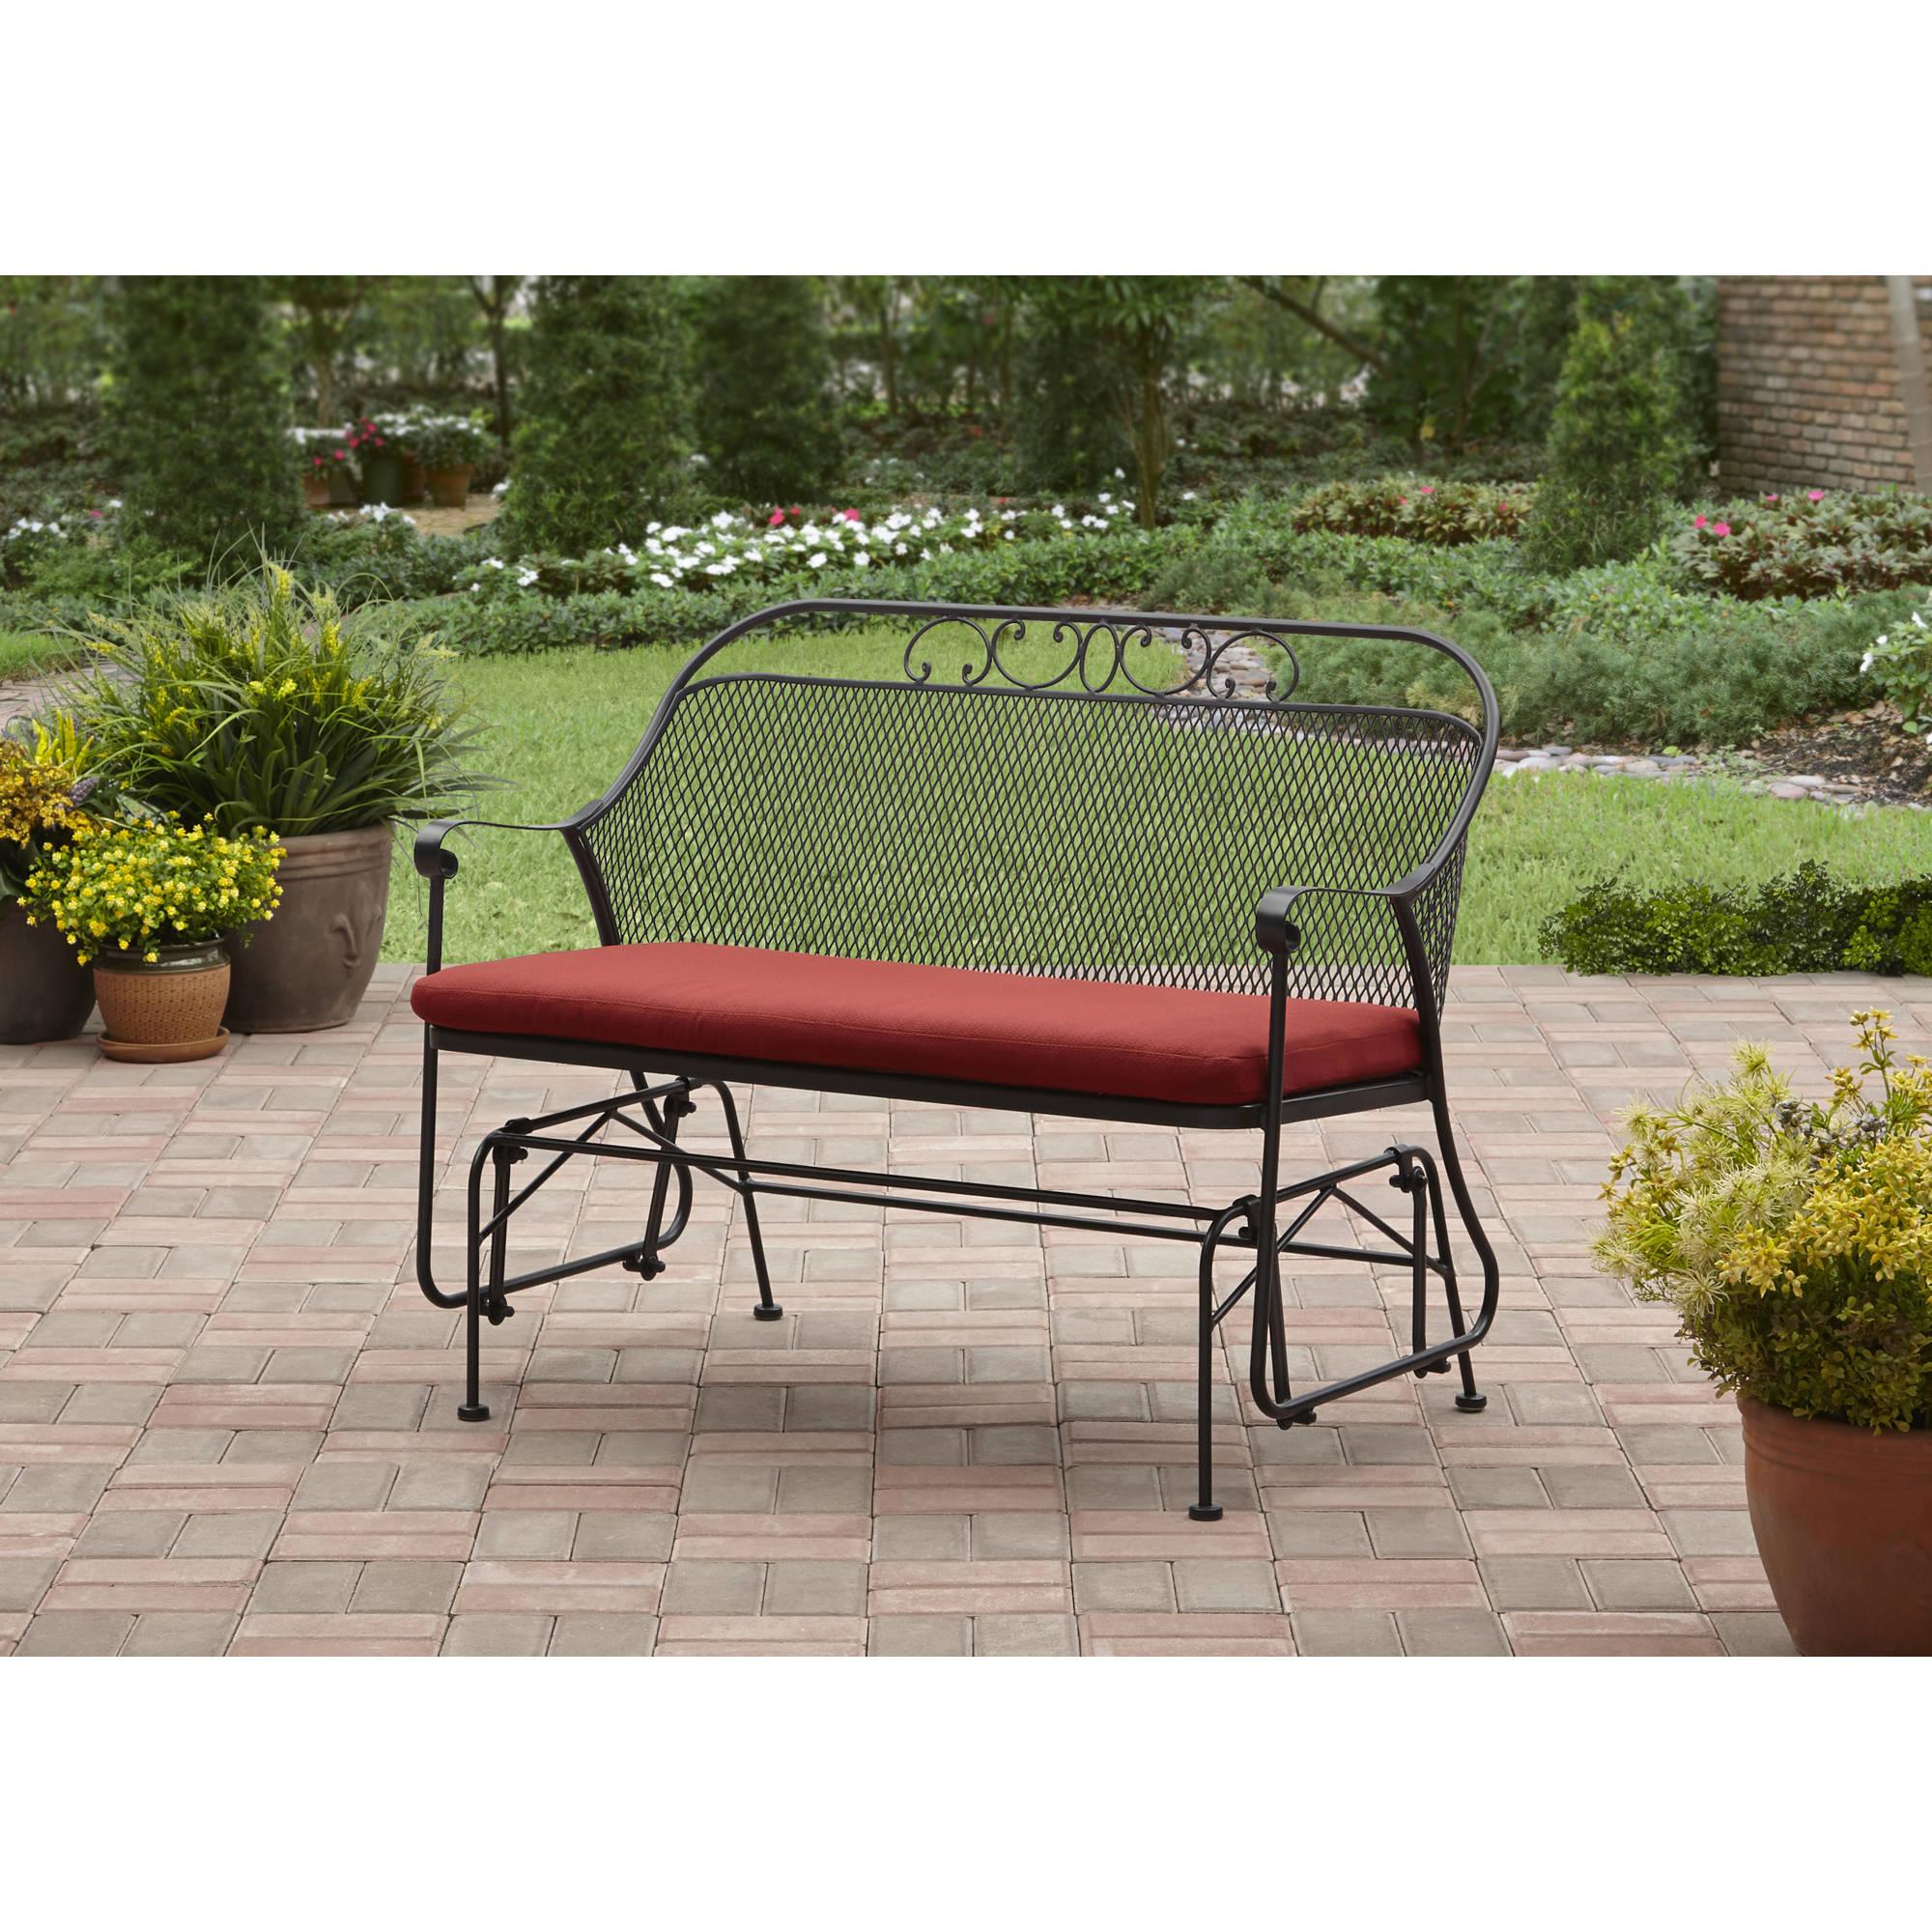 Furniture Patio Steel Costway Outdoor Swing Porch Rocker Regarding Favorite Outdoor Patio Swing Porch Rocker Glider Benches Loveseat Garden Seat Steel (View 24 of 30)